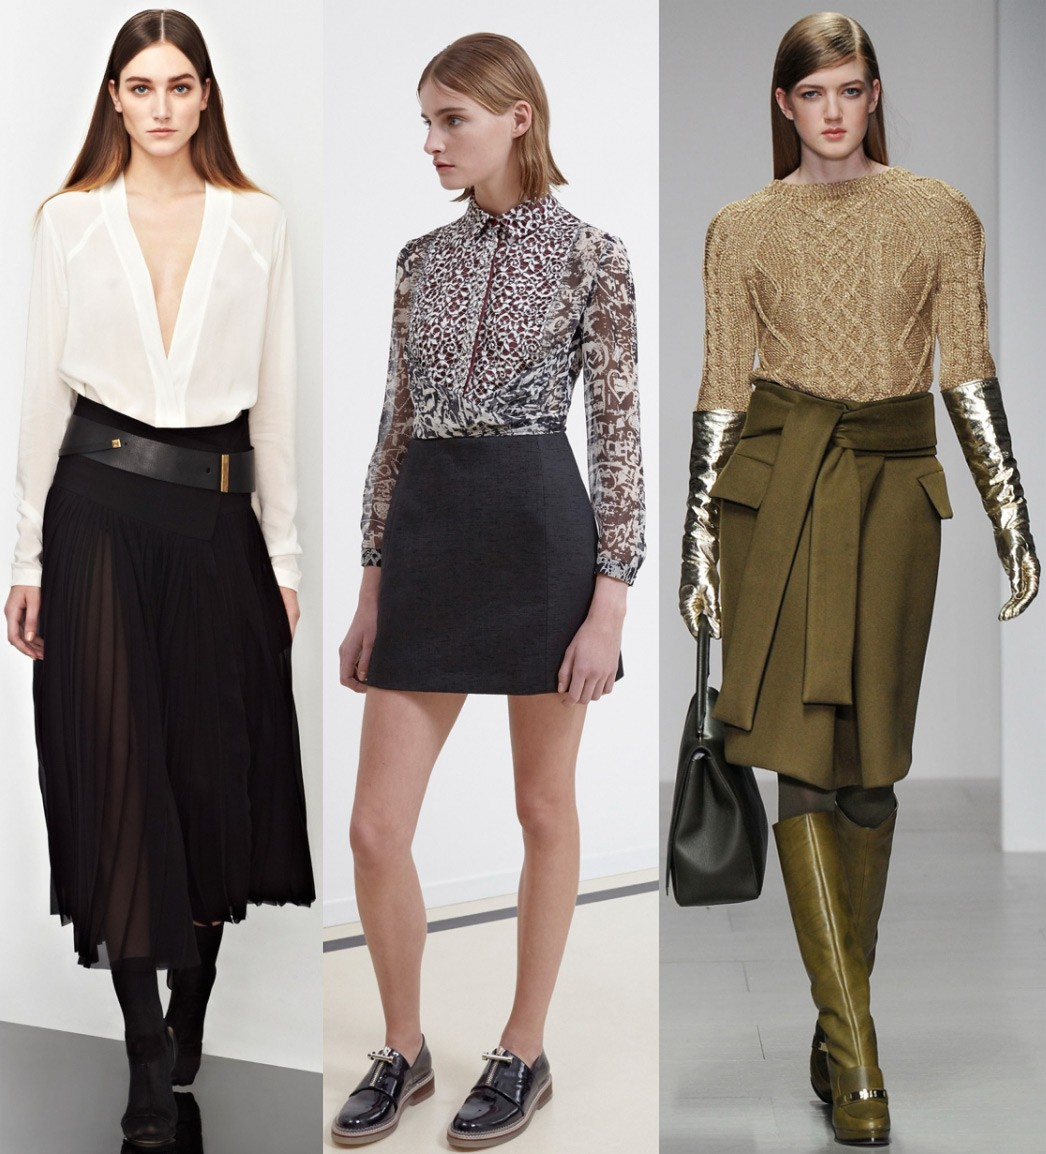 Модные юбки — фото, тенденции, новинки юбок